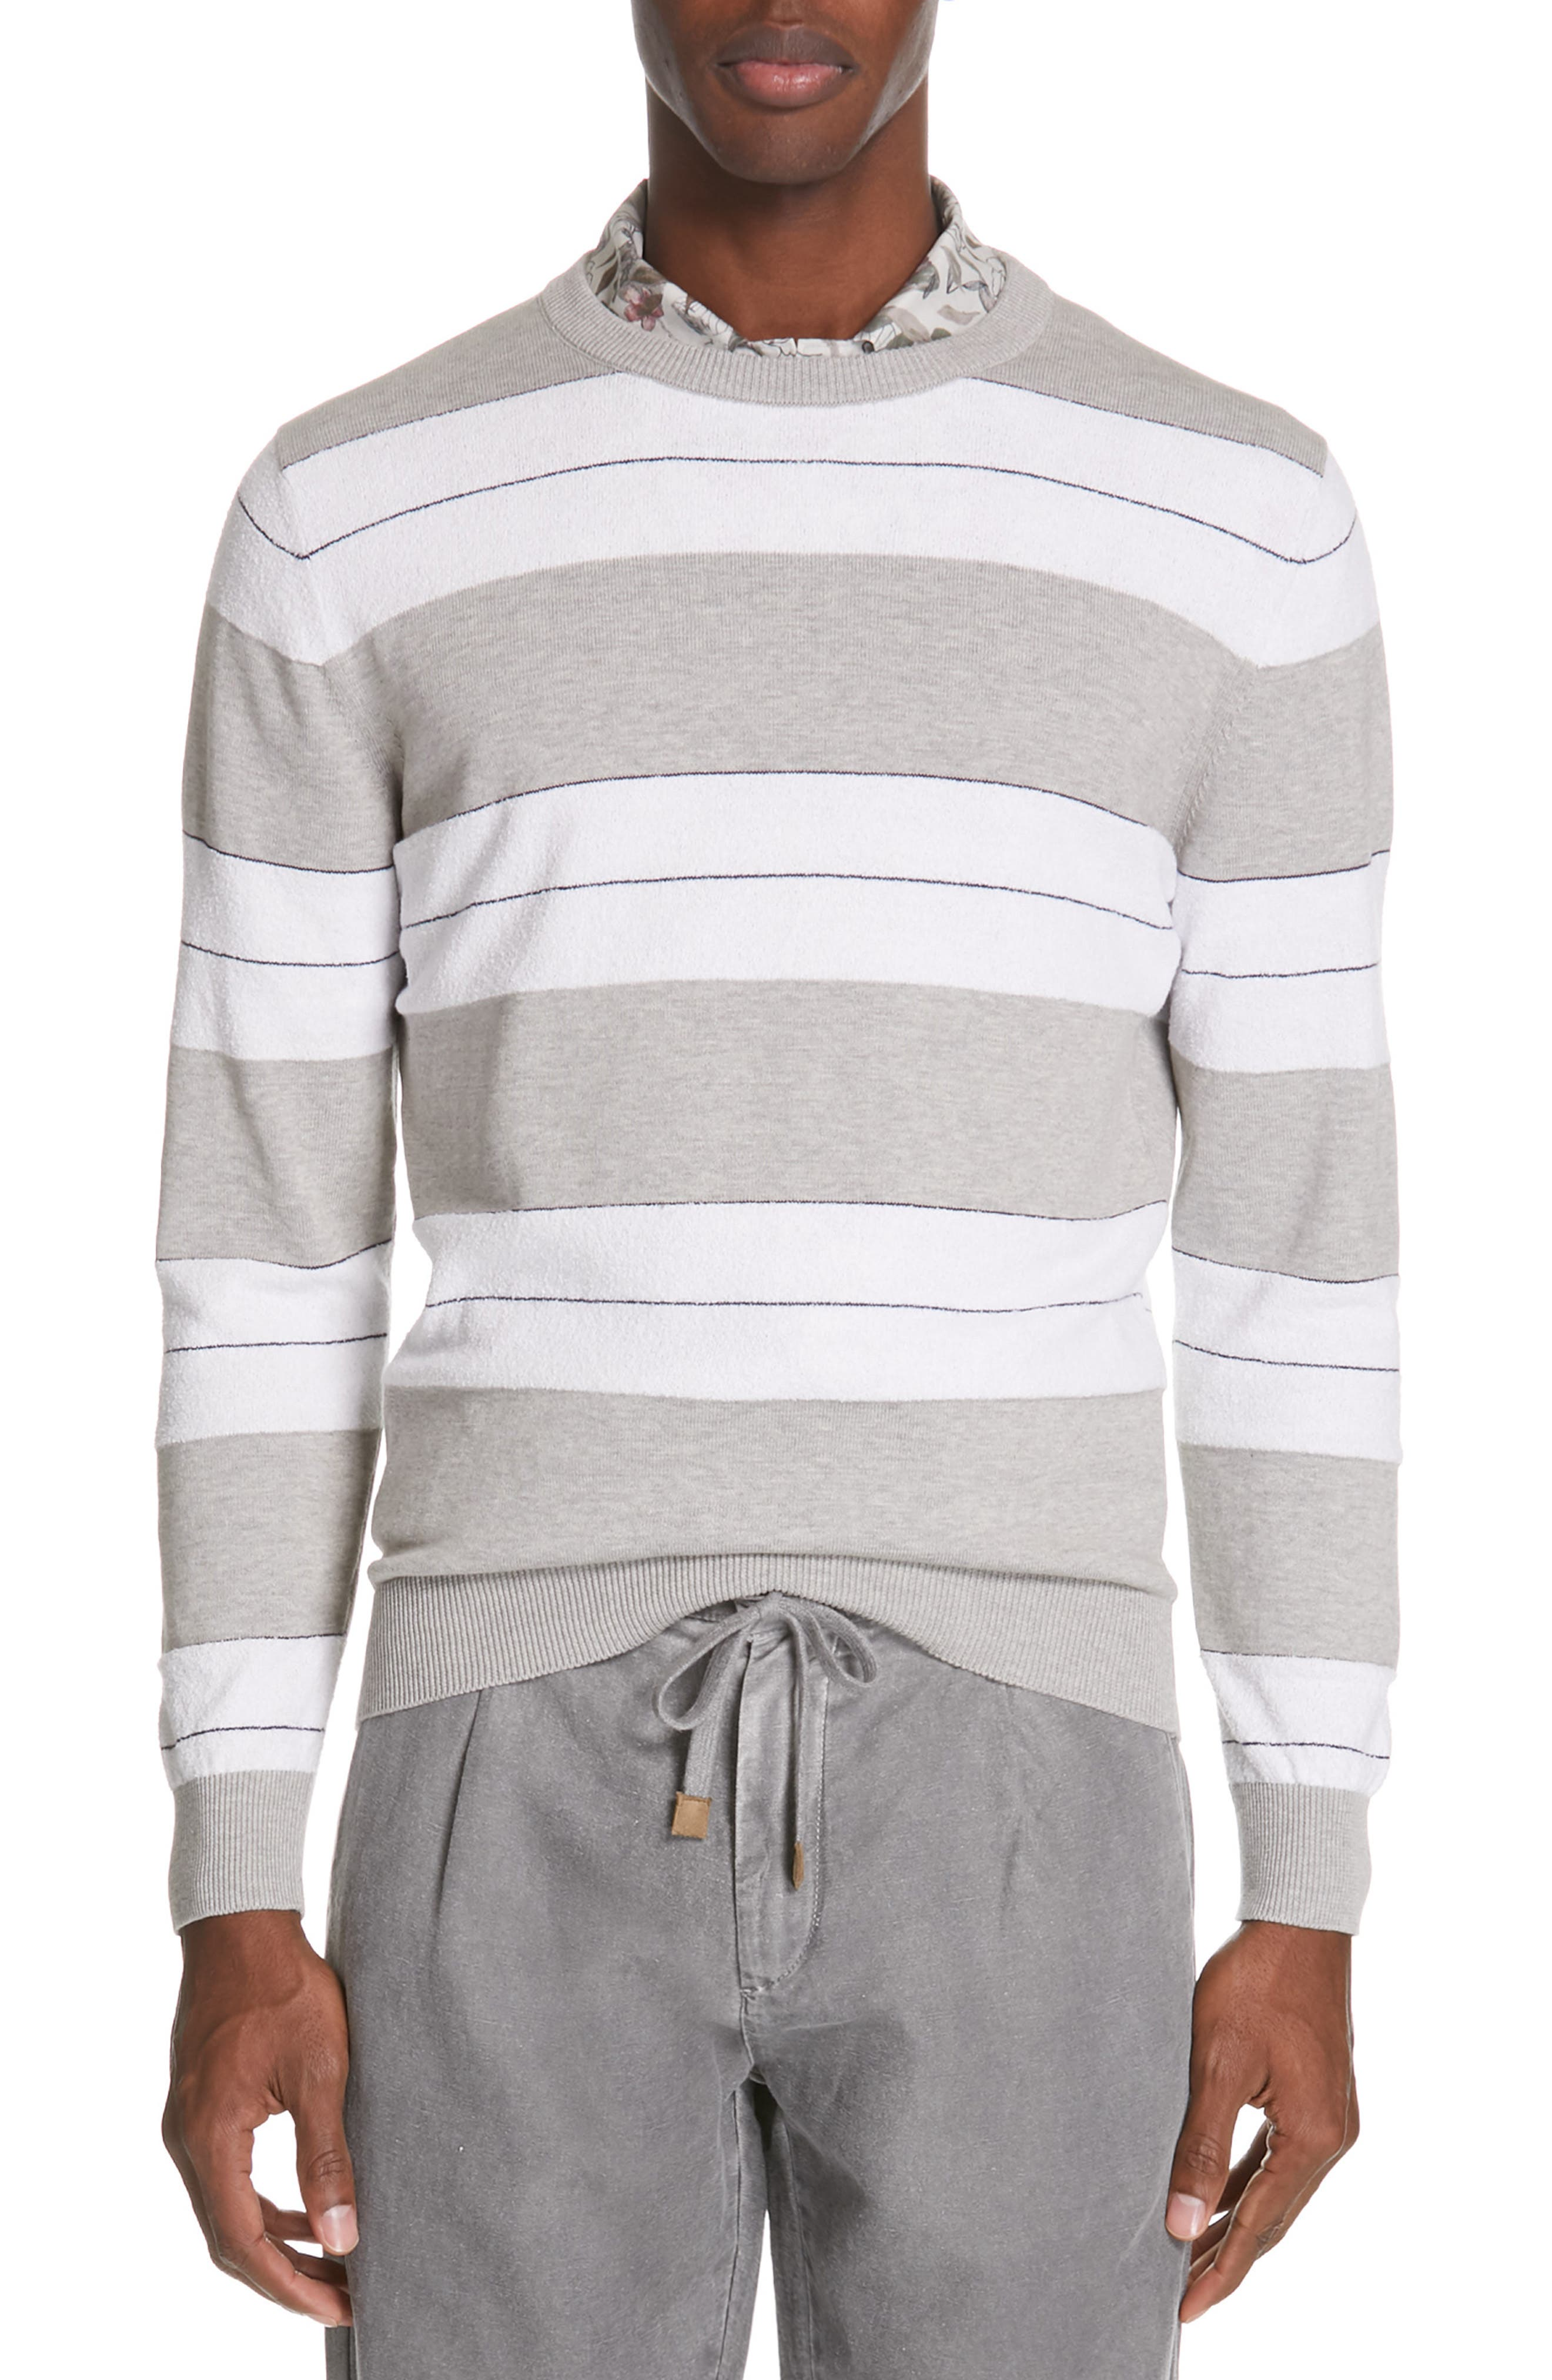 Eleventy Pullover Men's M Black Cotton  Slim Fit Striped Men's Clothing Clothing, Shoes & Accessories